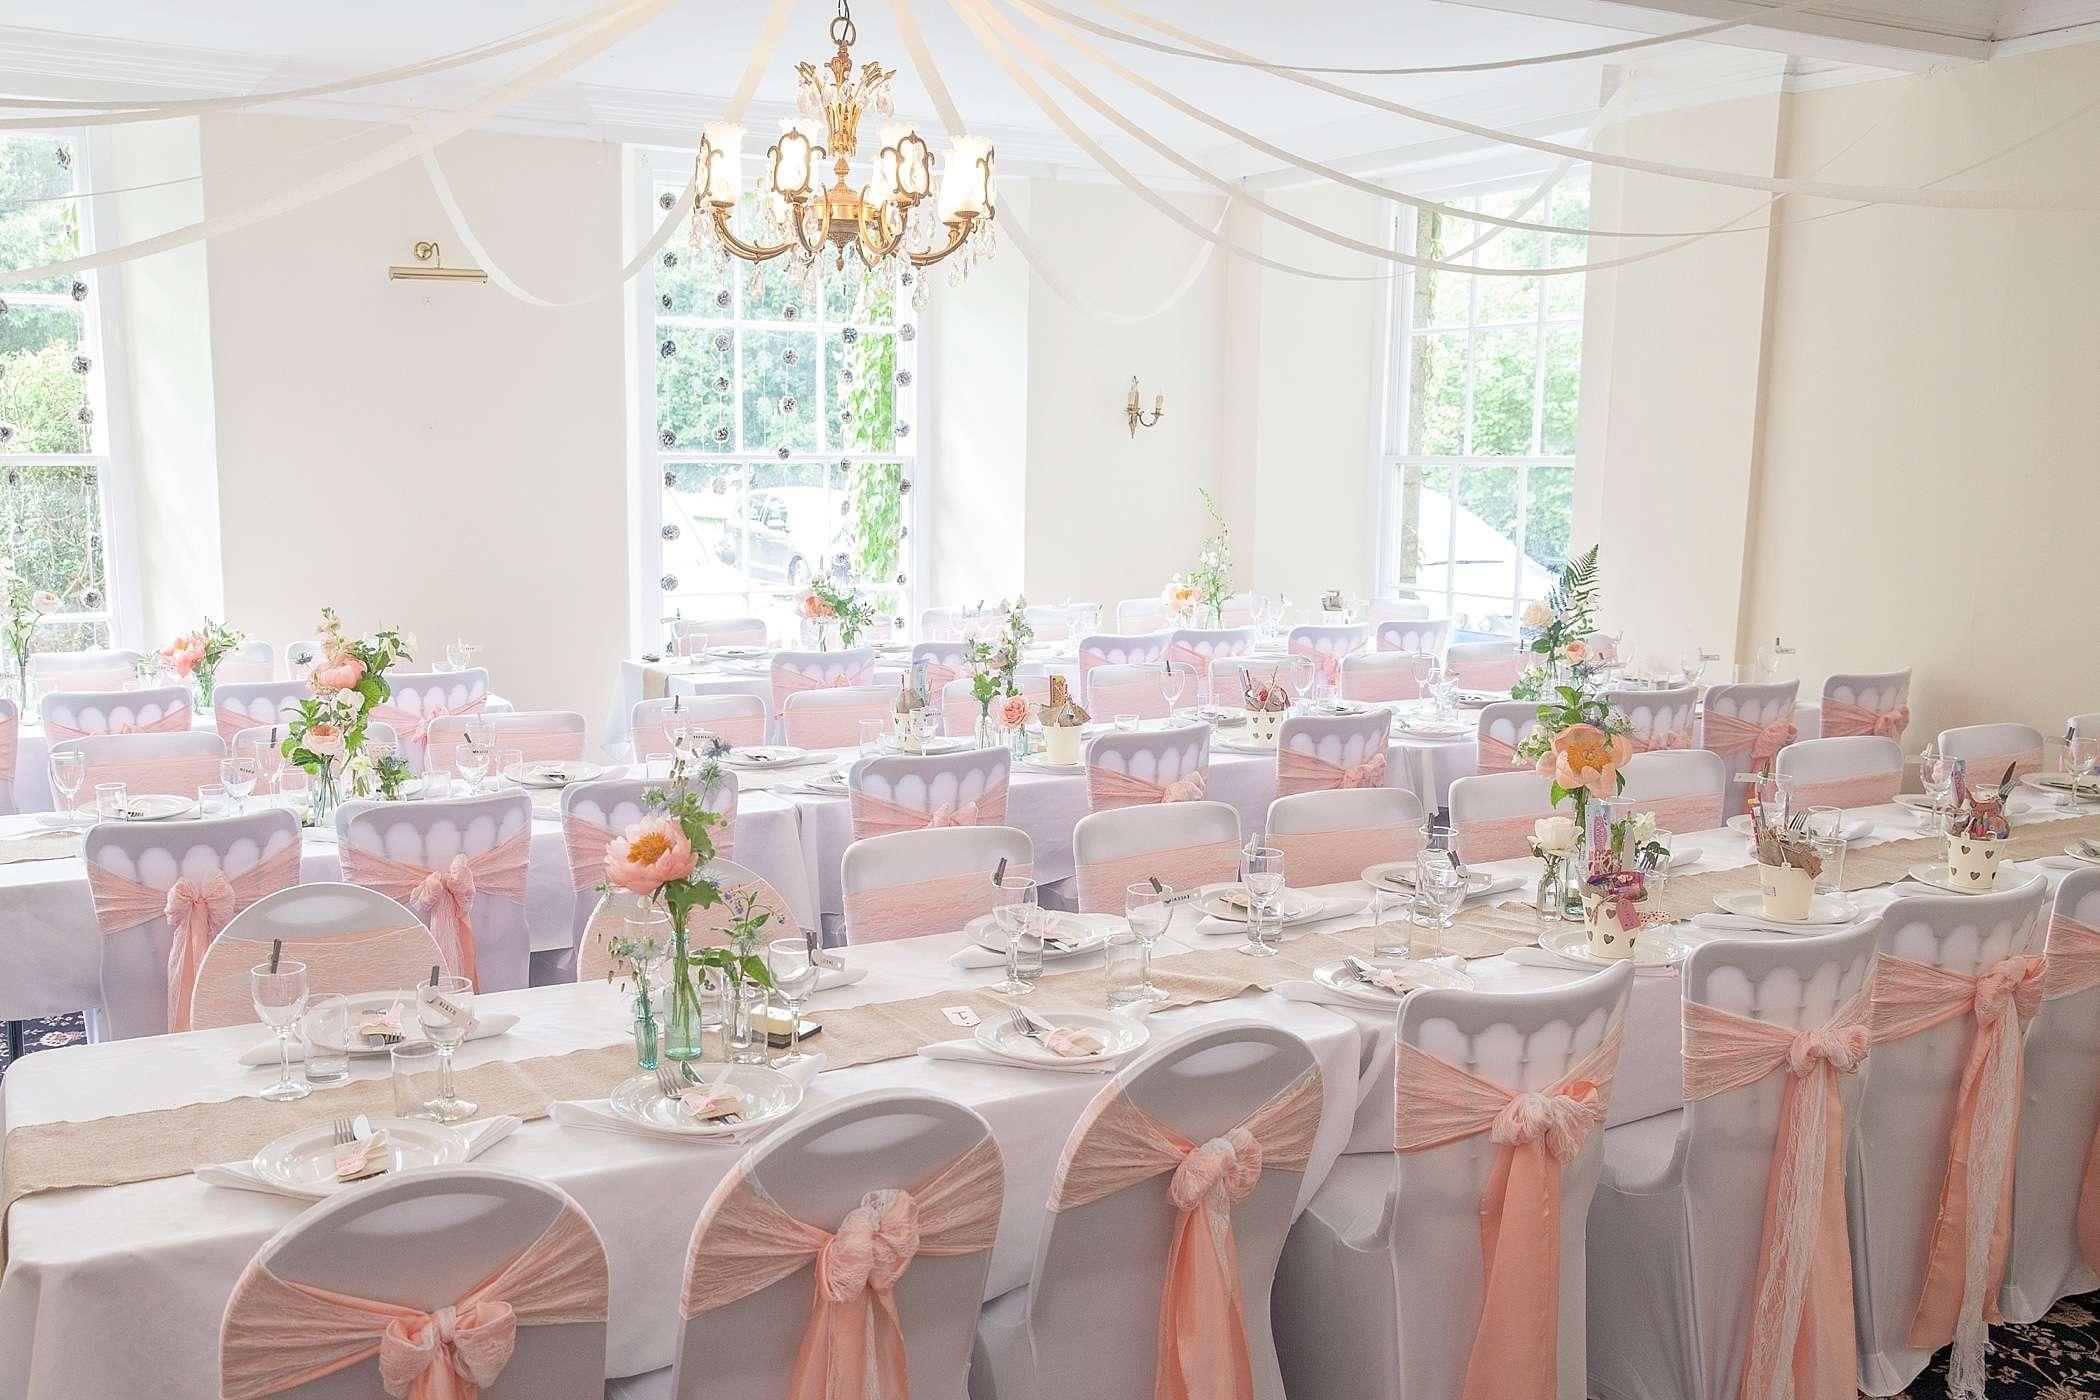 Colehayes wedding reception